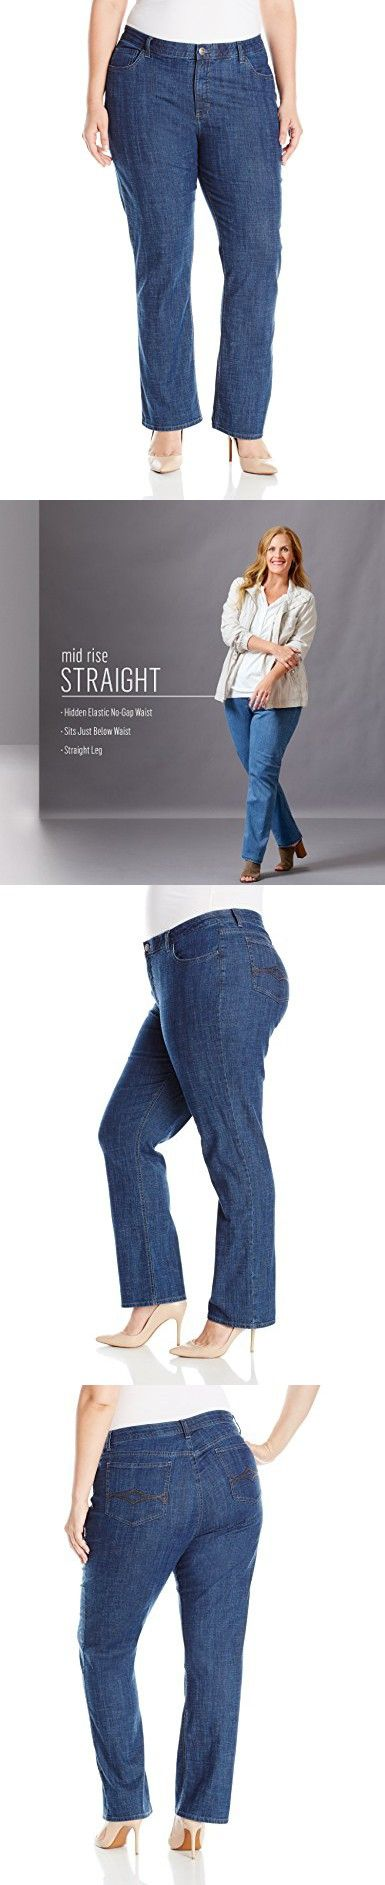 354f43a649 Riders by Lee Indigo Women s Plus-Size Slender Stretch Slim Straight Leg  Jean